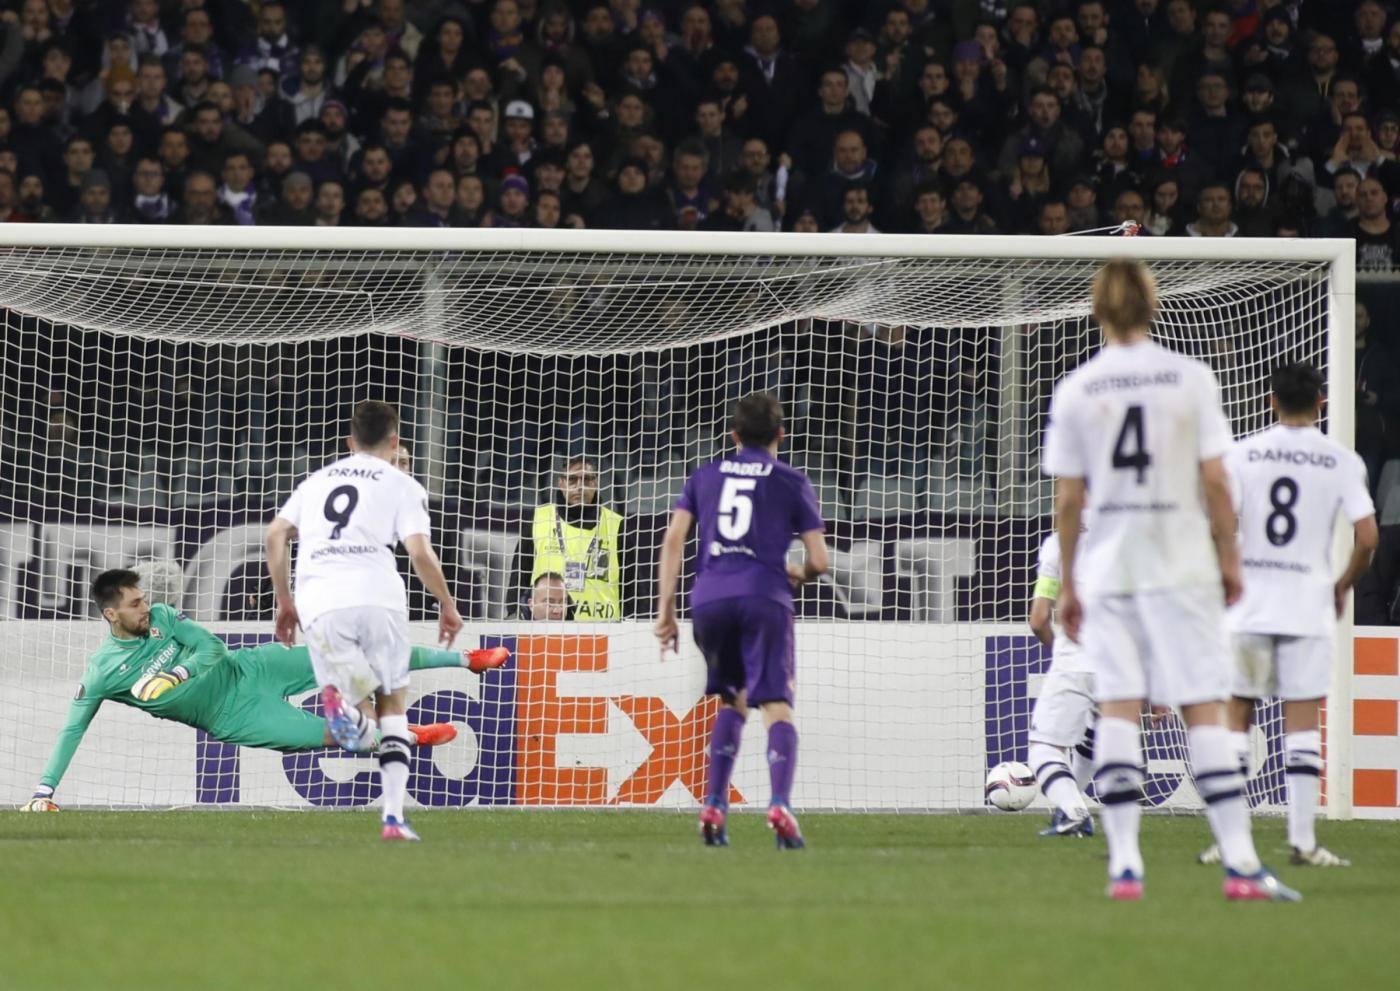 Fiorentina-Borussia Moenchengladbach 2-4: pagelle, marcatori, highlights e gol